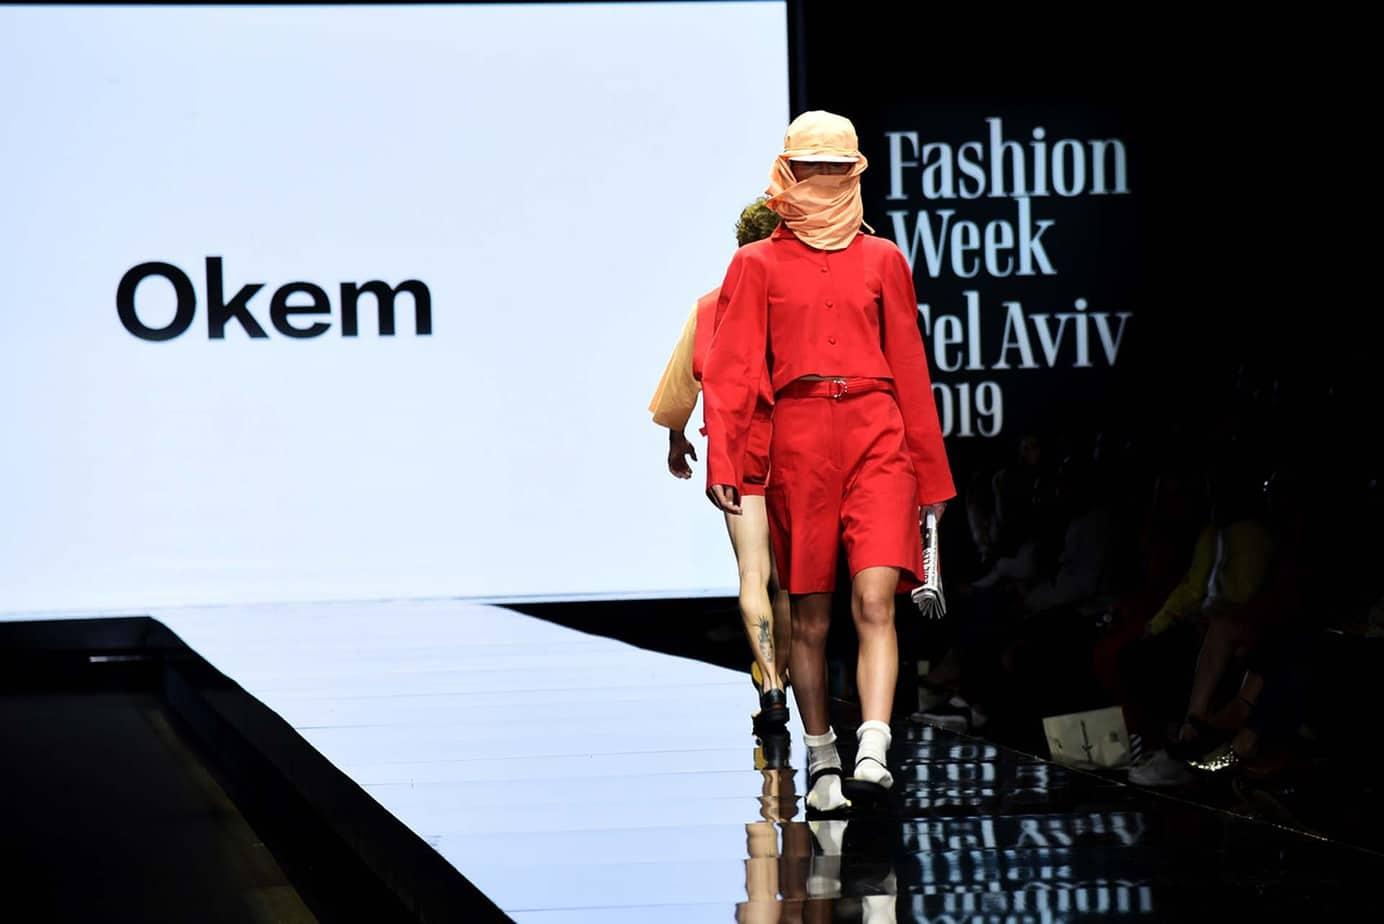 OKEM. חממת מפעל הפיס. שבוע האופנה תל אביב 2019. צילום: לימור יערי